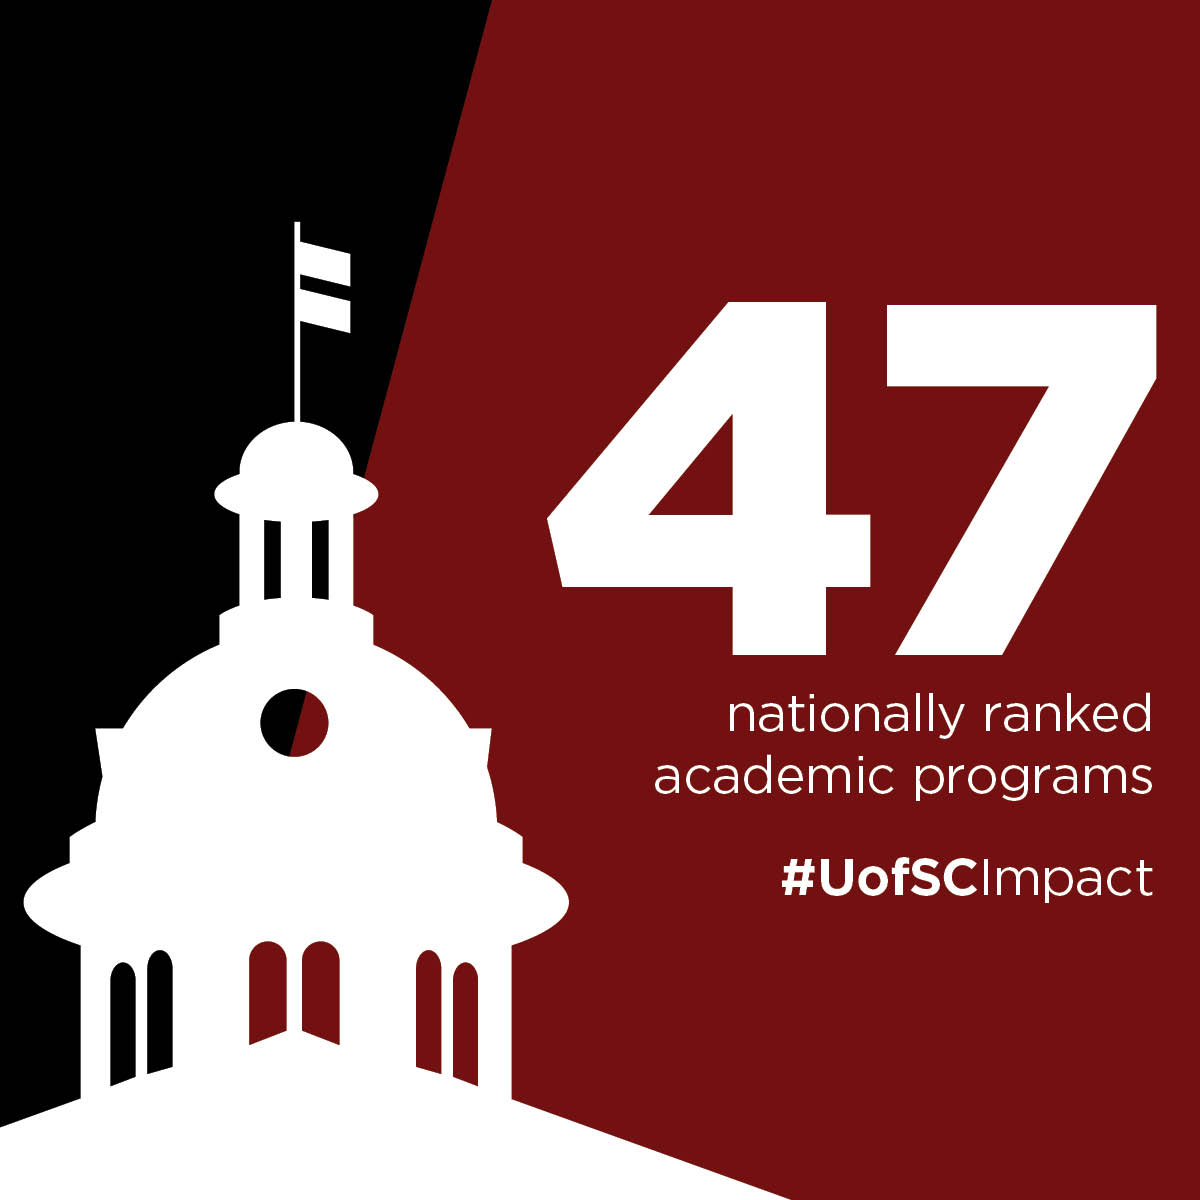 47 nationally ranked academic programs #UofSCImpact